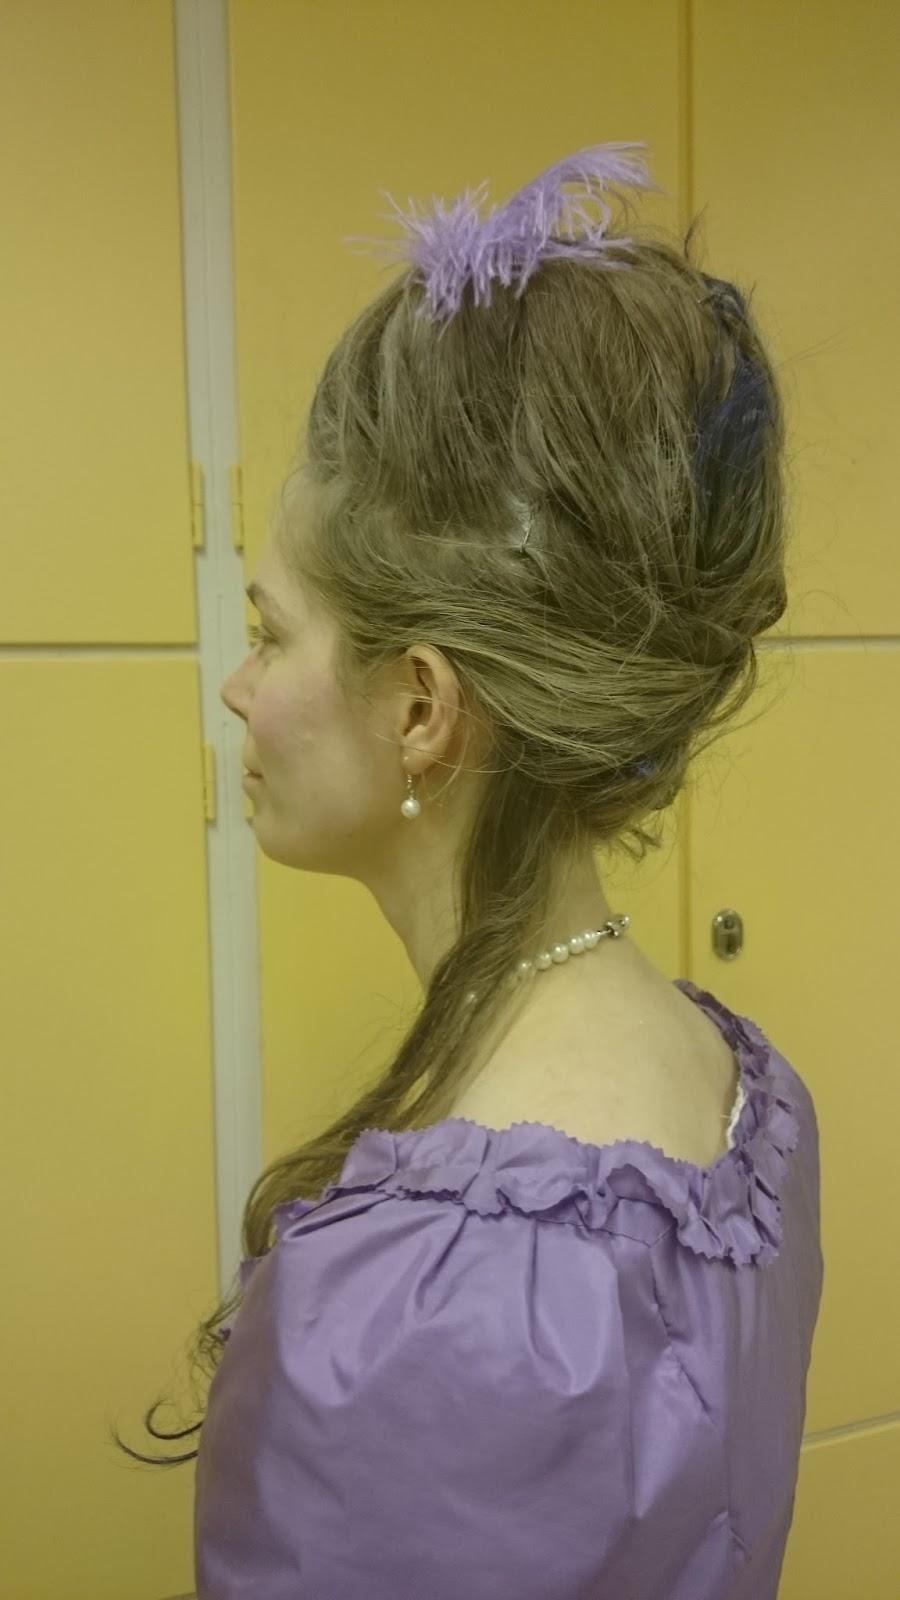 A Costuming Engineer Big 1770s Hair At The Ball